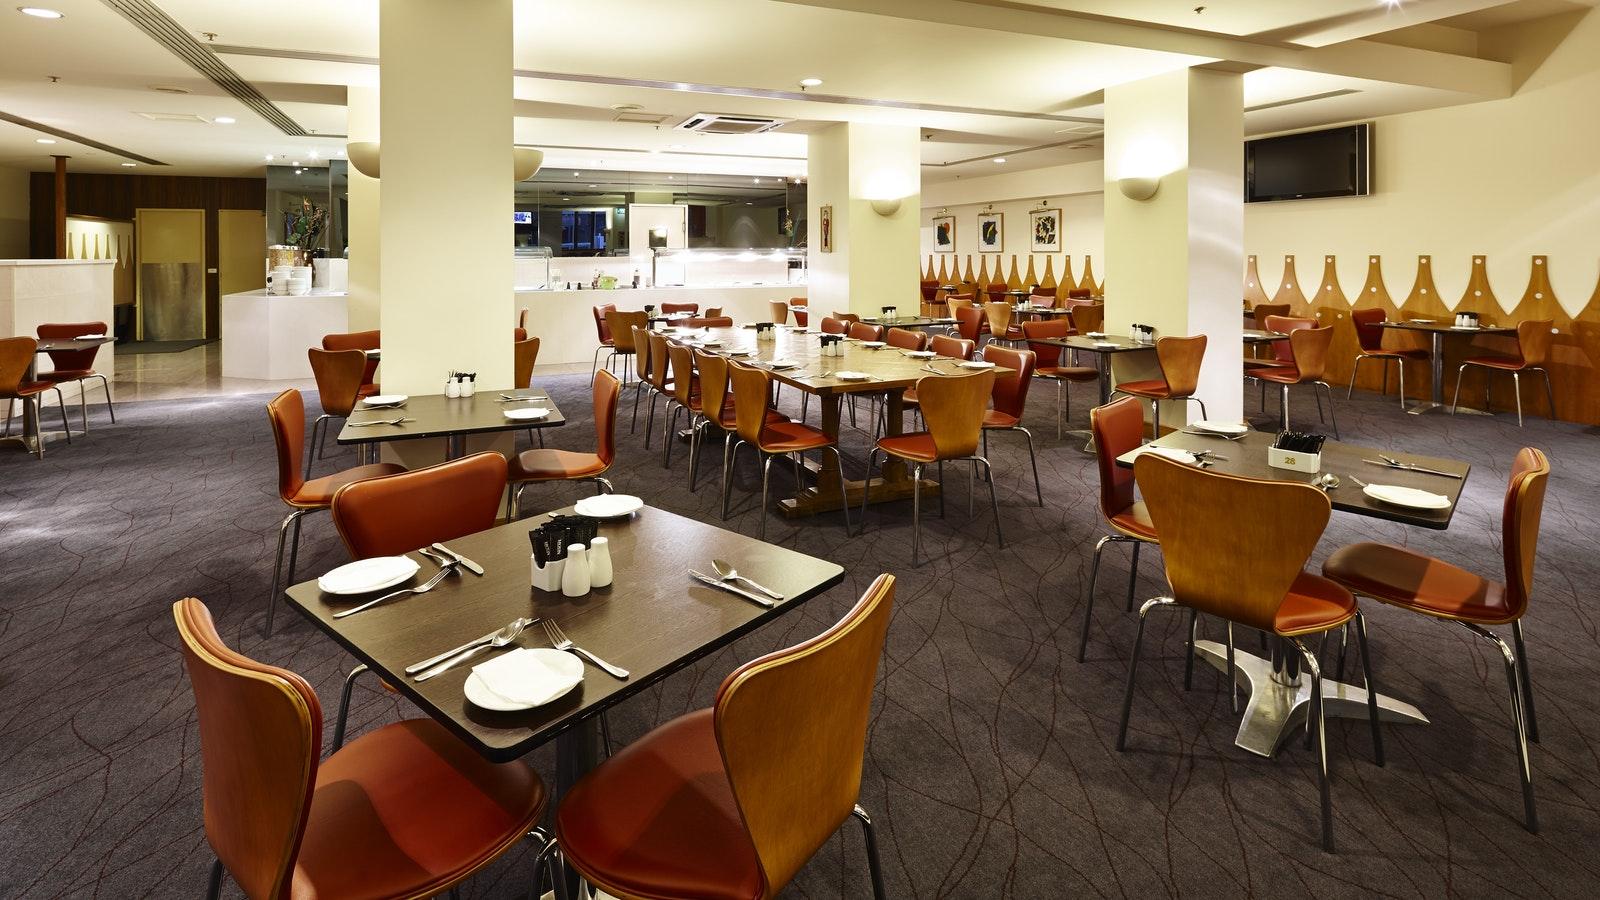 Hotel Restaurant, photograph by Rhiannon Slatter